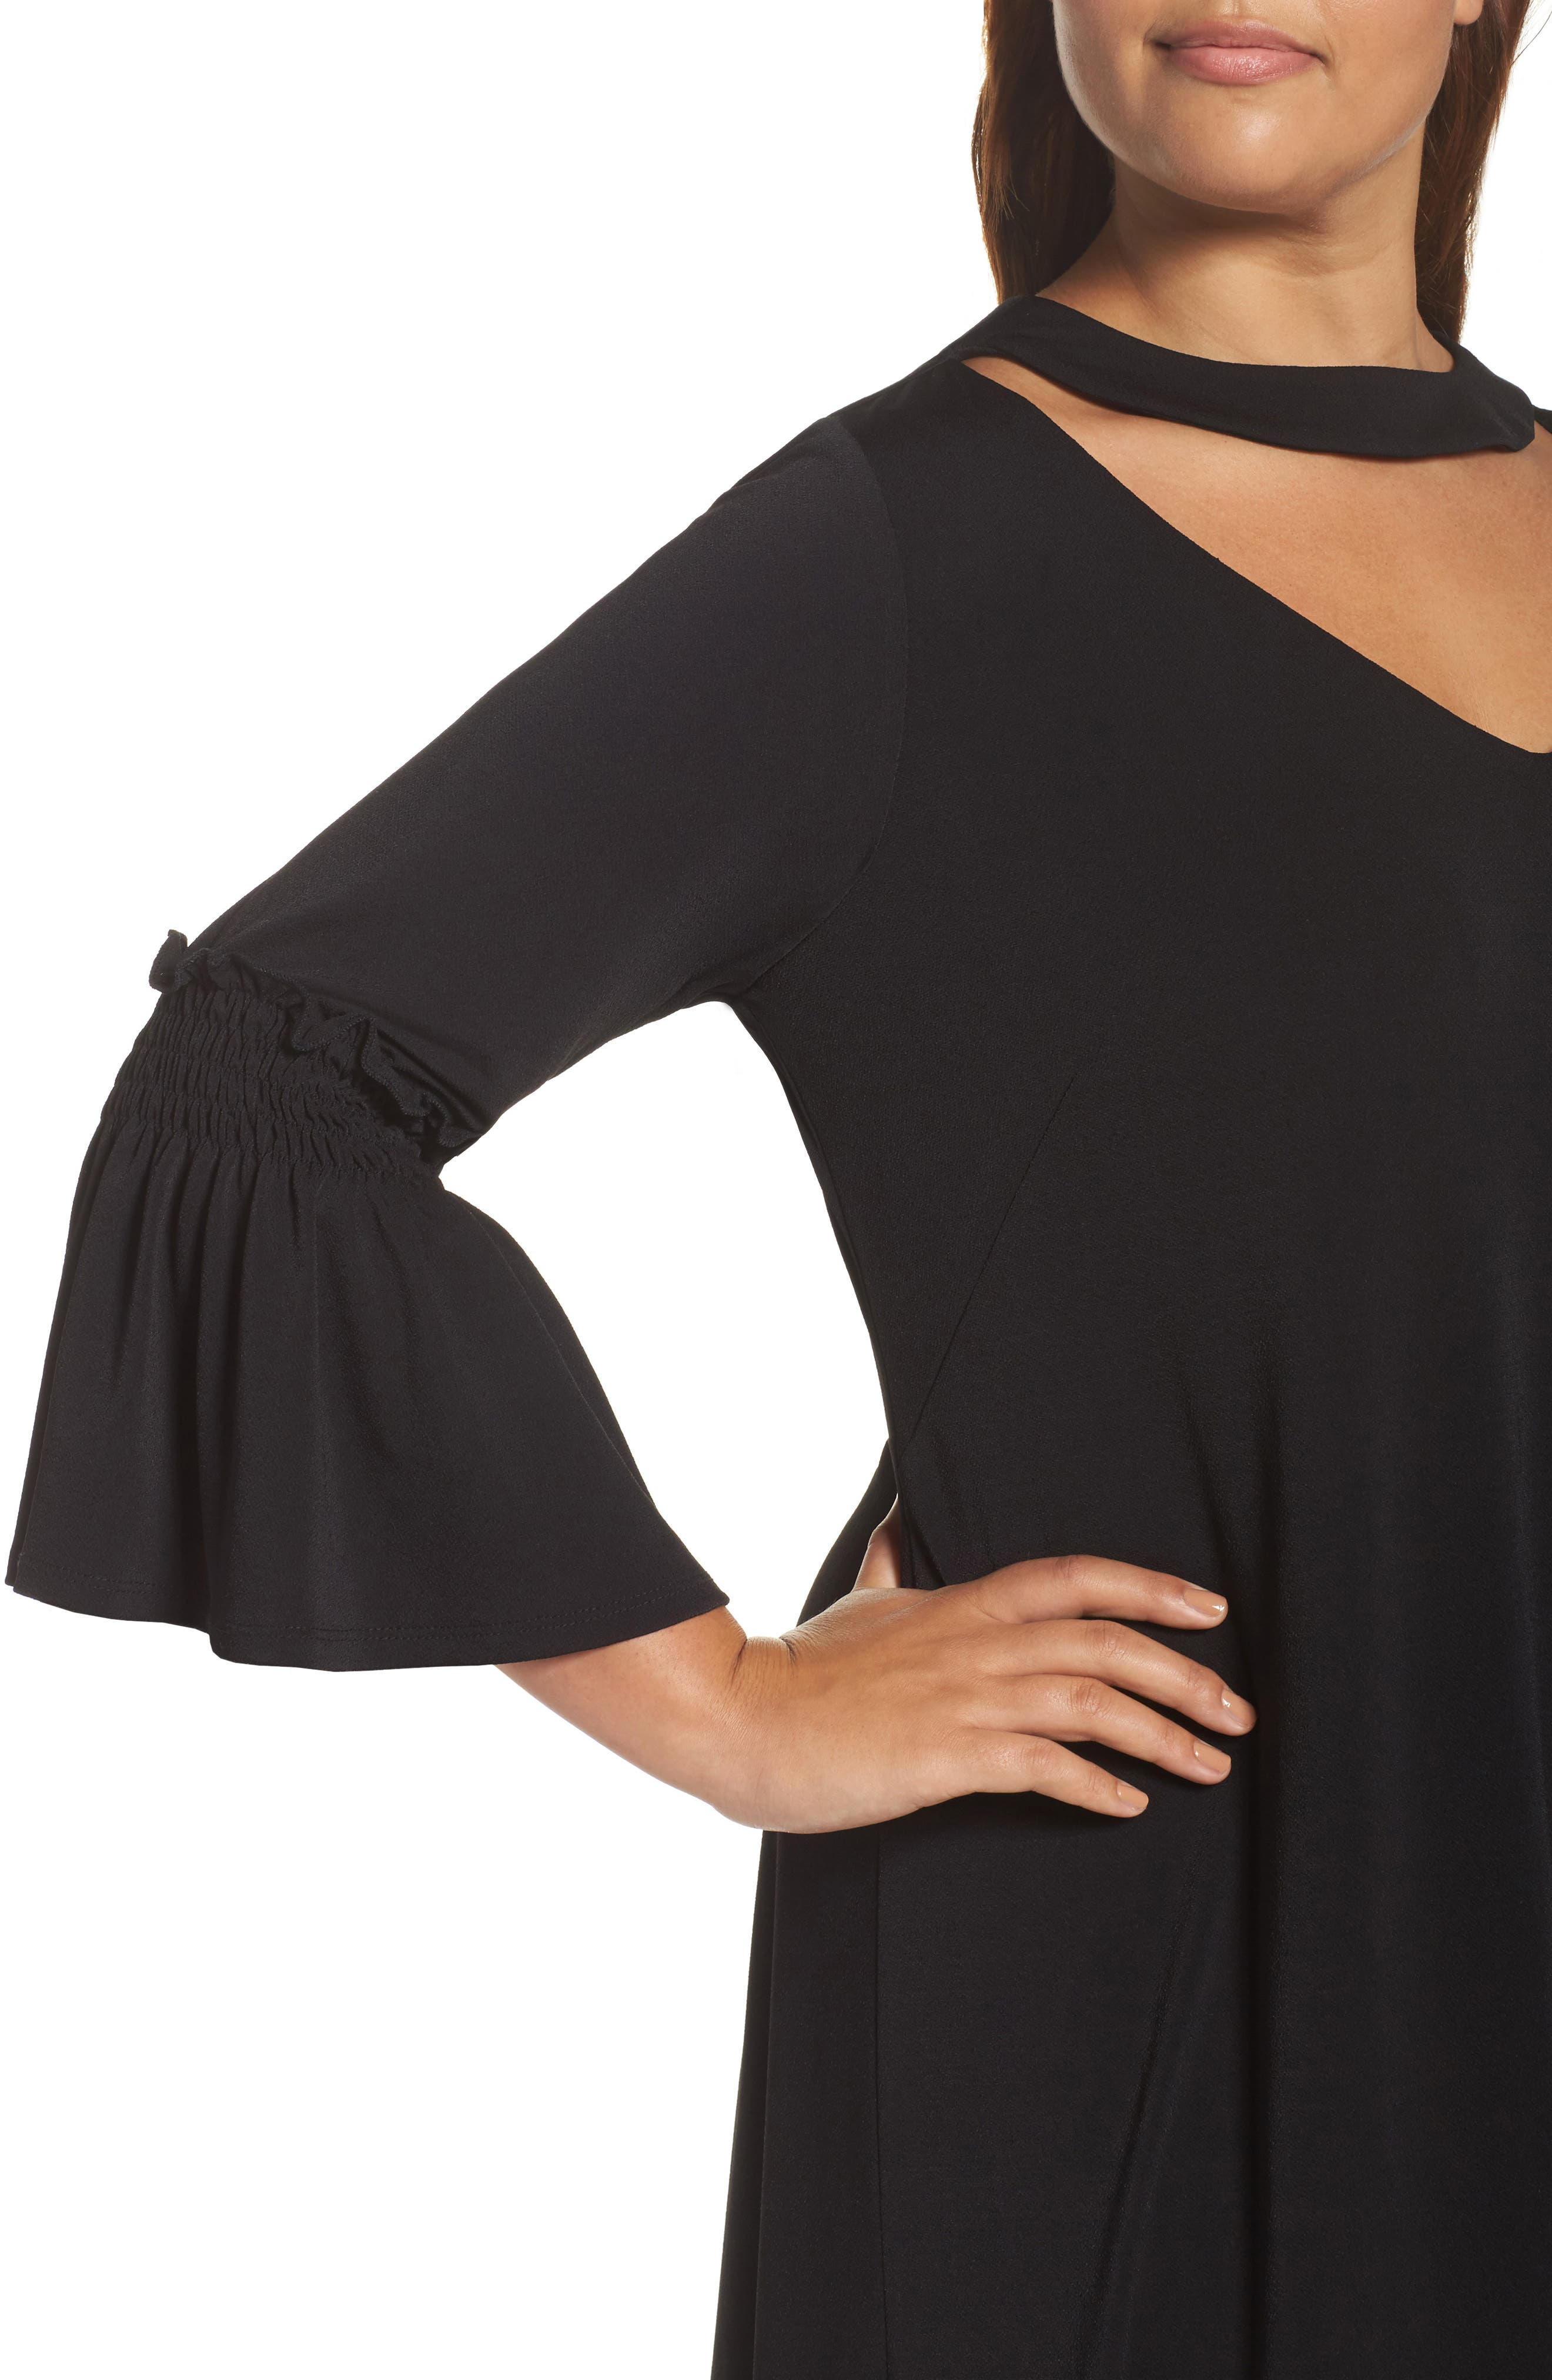 Bell Sleeve A-Line Choker Dress,                             Alternate thumbnail 4, color,                             001